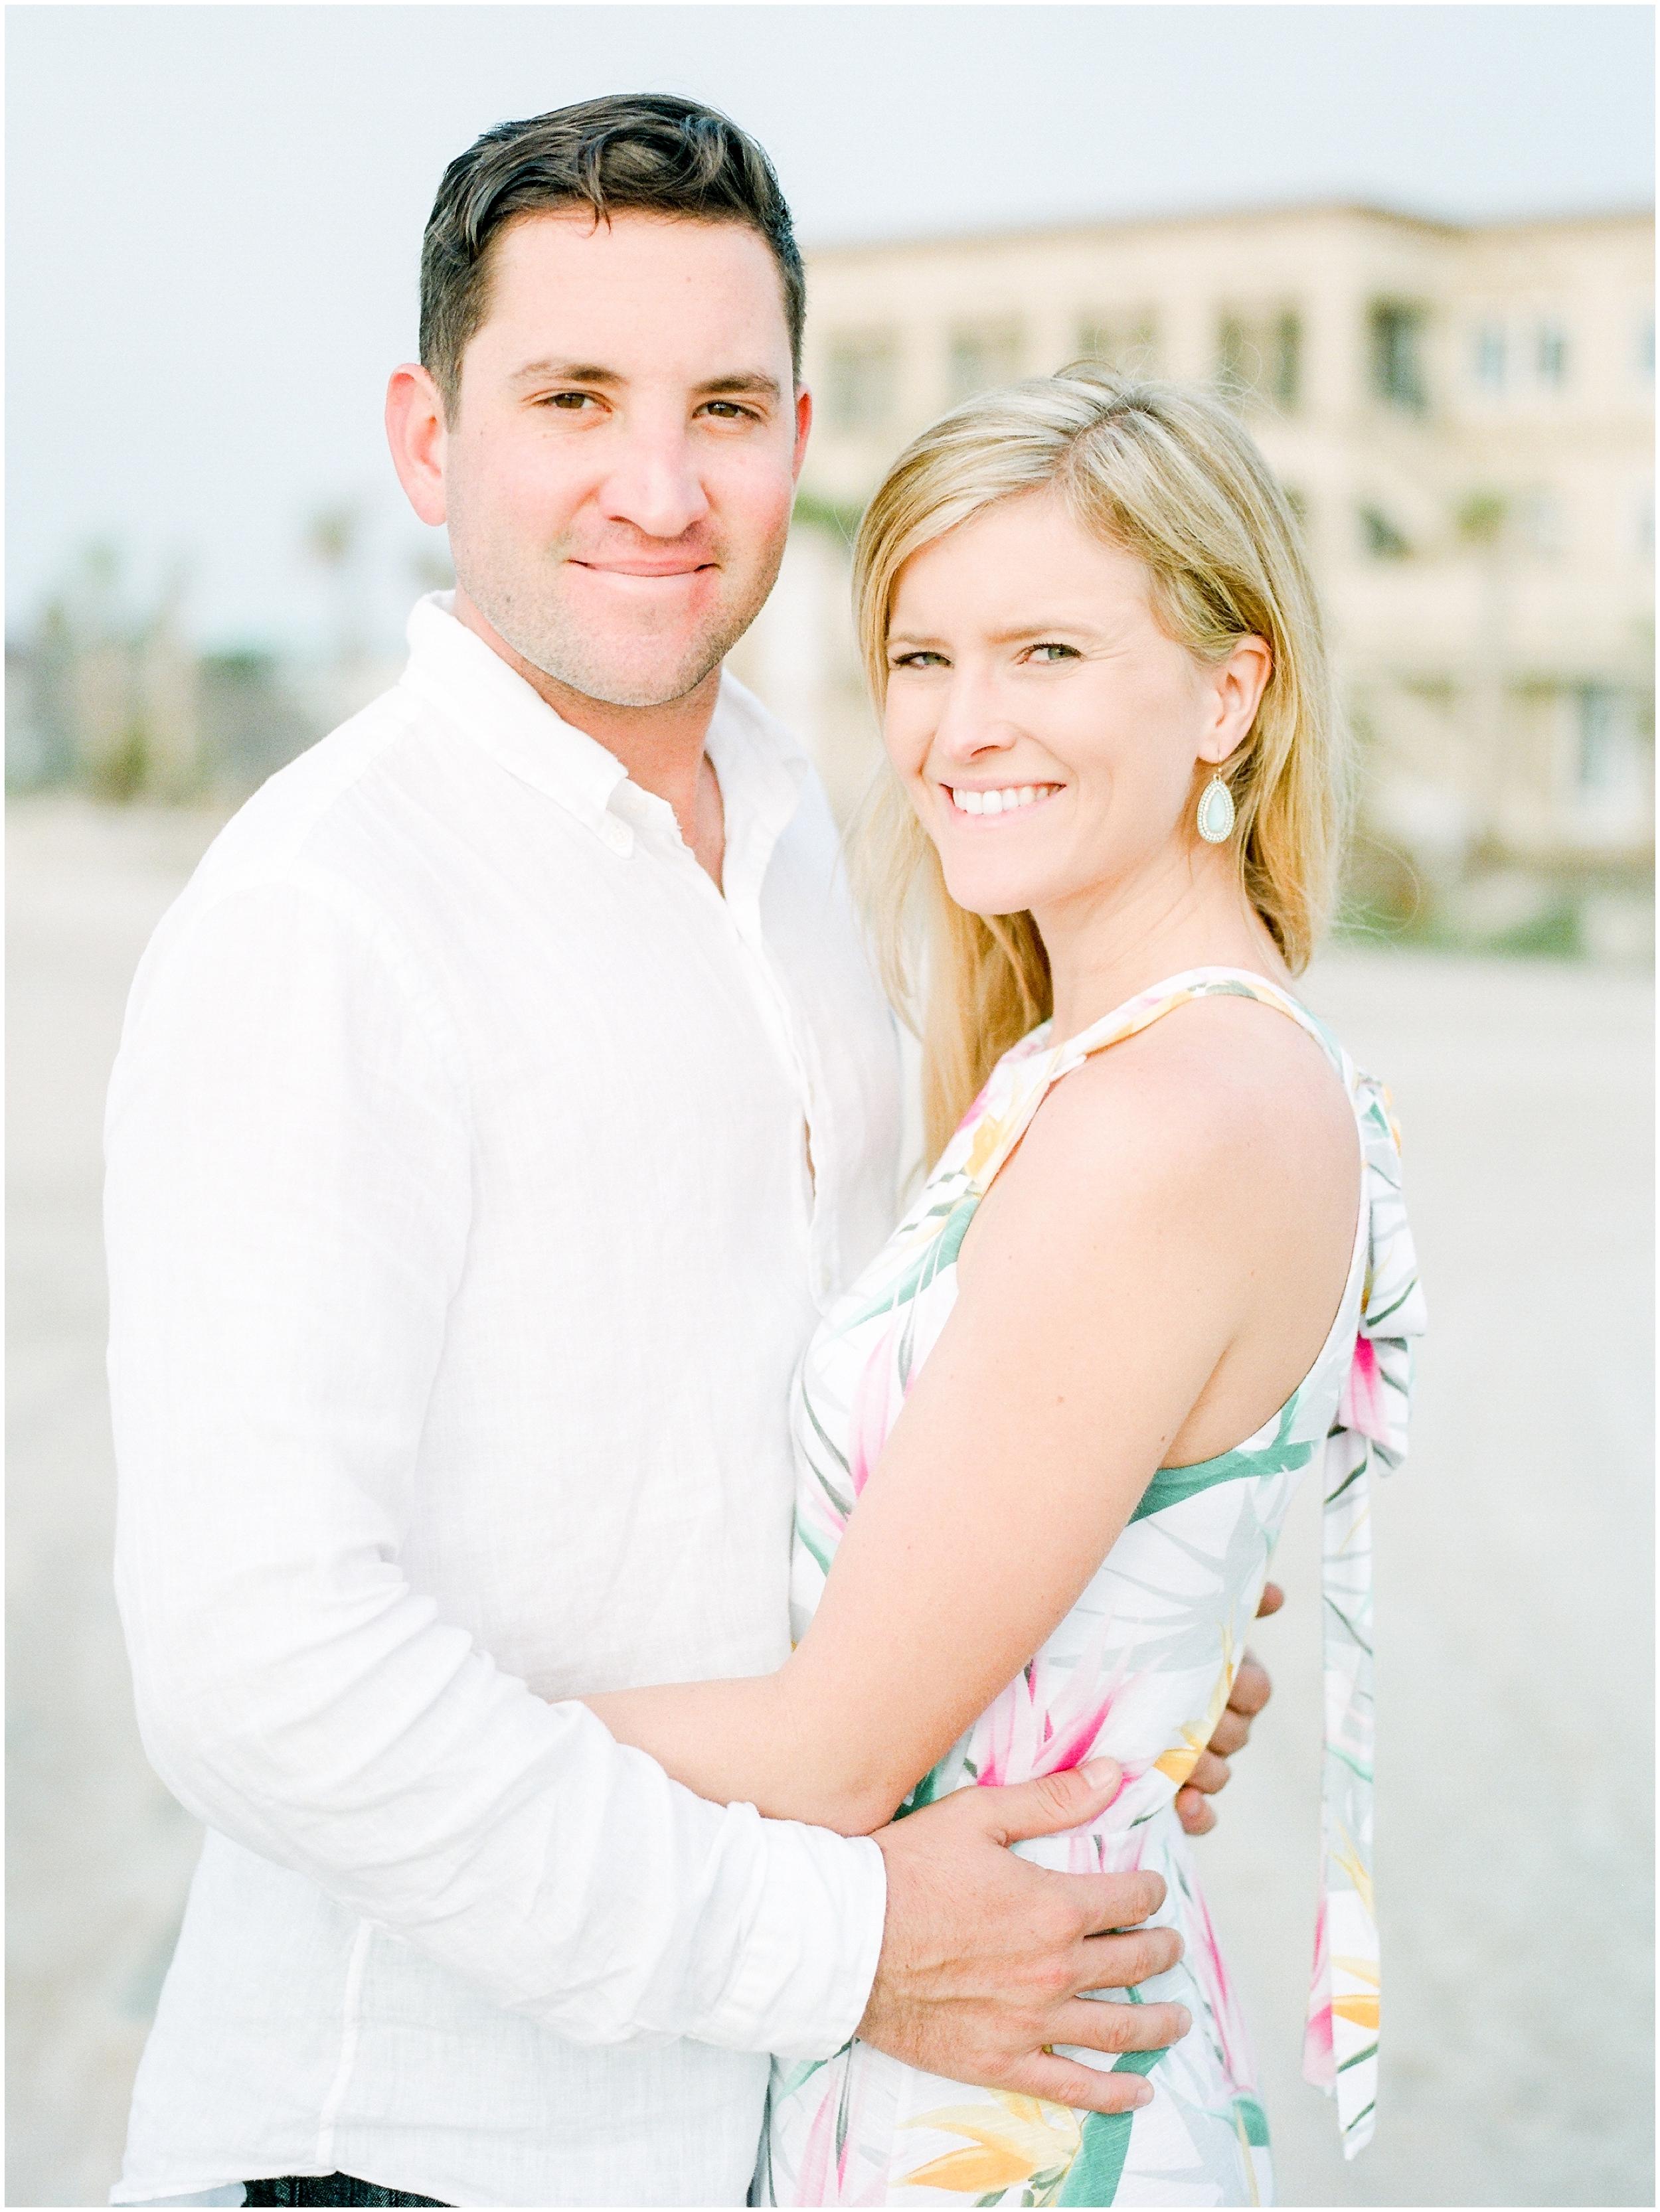 Sunrise Engagement Session at Vilano Beach- Jacksonville, Florida Fine Art Film Wedding Photography_0029.jpg